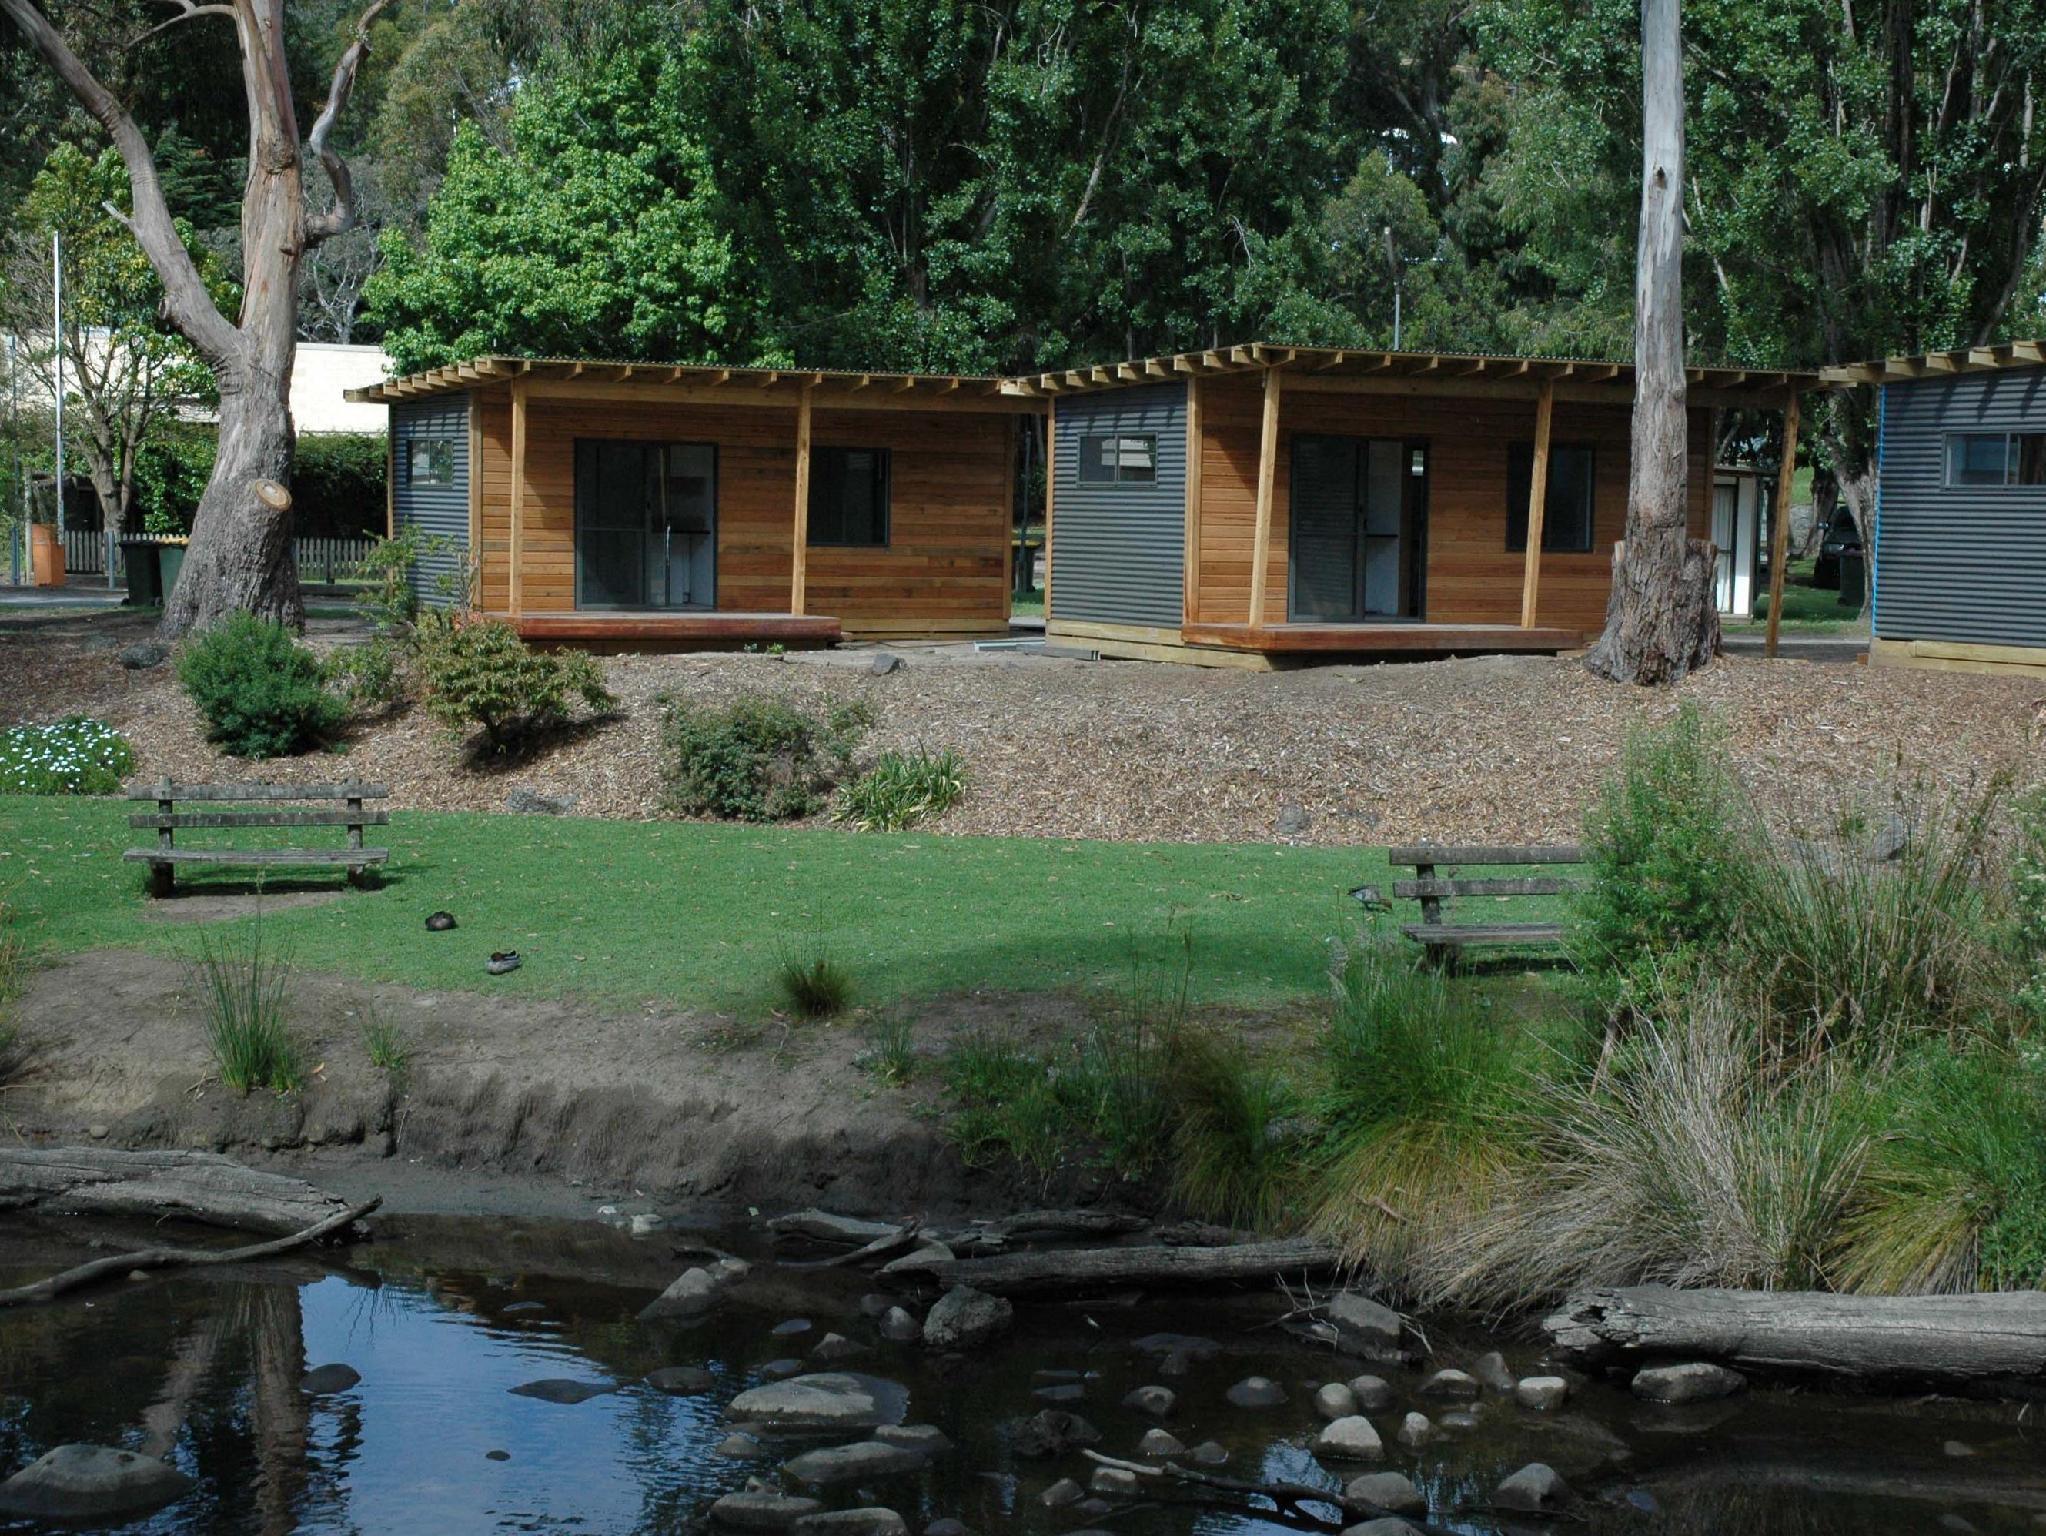 Lorne Foreshore Caravan Park - Hotell och Boende i Australien , Great Ocean Road - Lorne